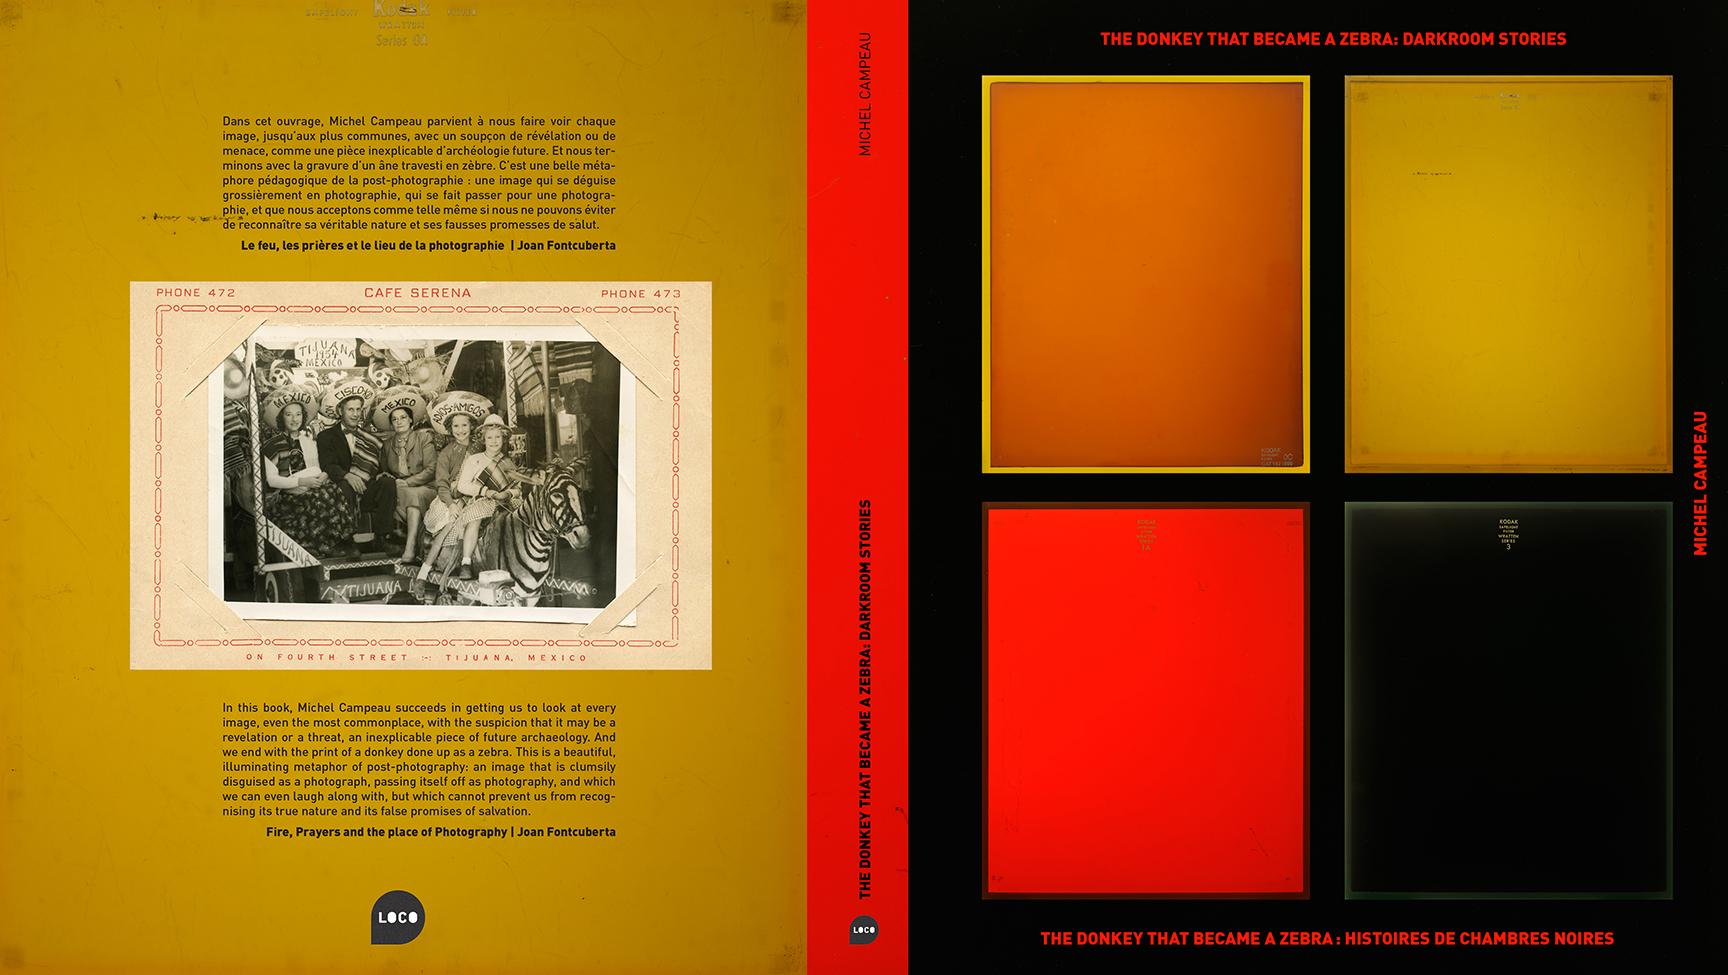 The Donkey that Became a Zebra: Darkroom Stories | Histoires de chambre noire  Maquette nominée au LUMA Rencontres Dummy Book Award, Arles 2015